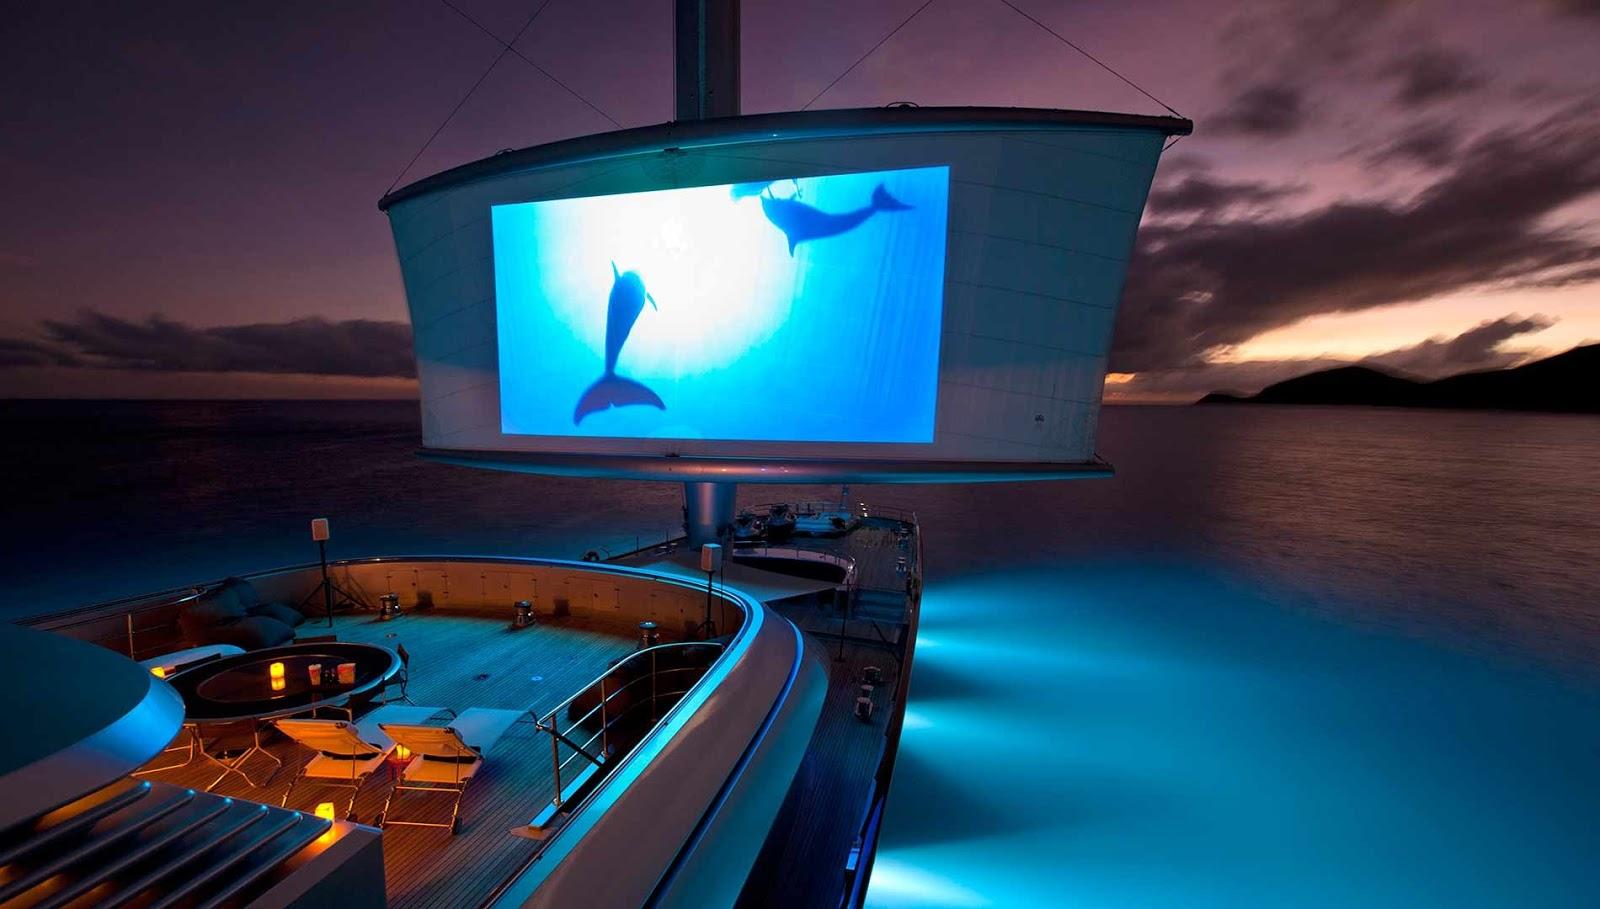 alquiler de veleros en ibiza. alquiler veleros ibiza. alquiler de veleros en ibiza. alquiler veleros ibiza. alquilar yates en ibiza. barcos de alquiler en ibiza